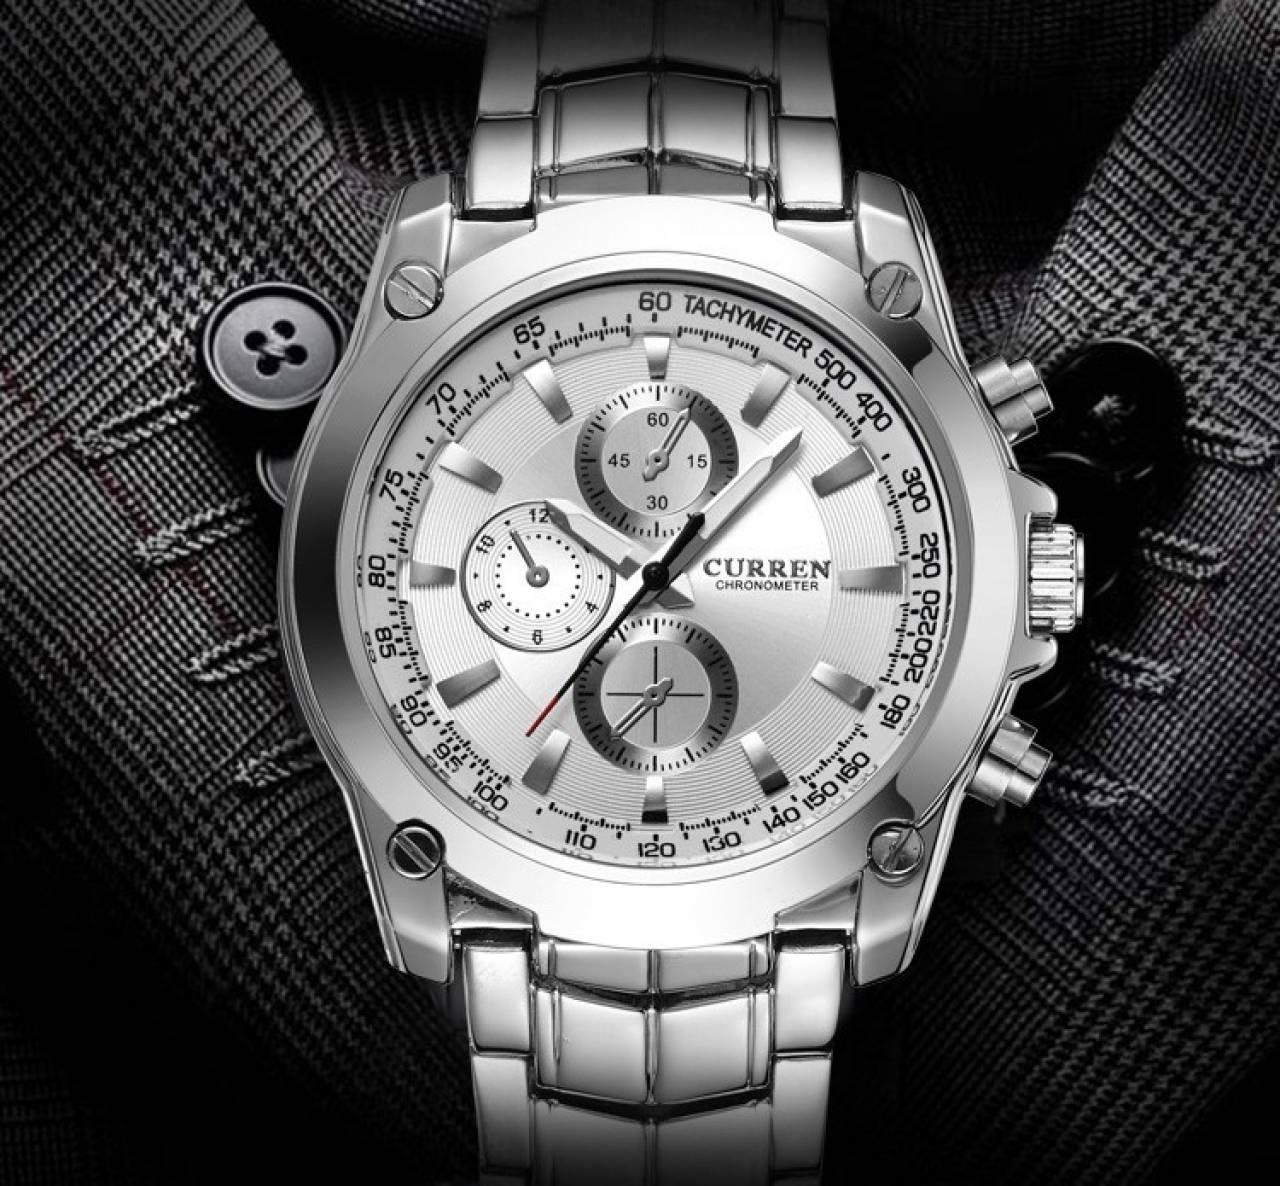 e5273b6c1af5 Joyas y Accesorios Andrew Jewels   Curren - Reloj Marca Curren para ...